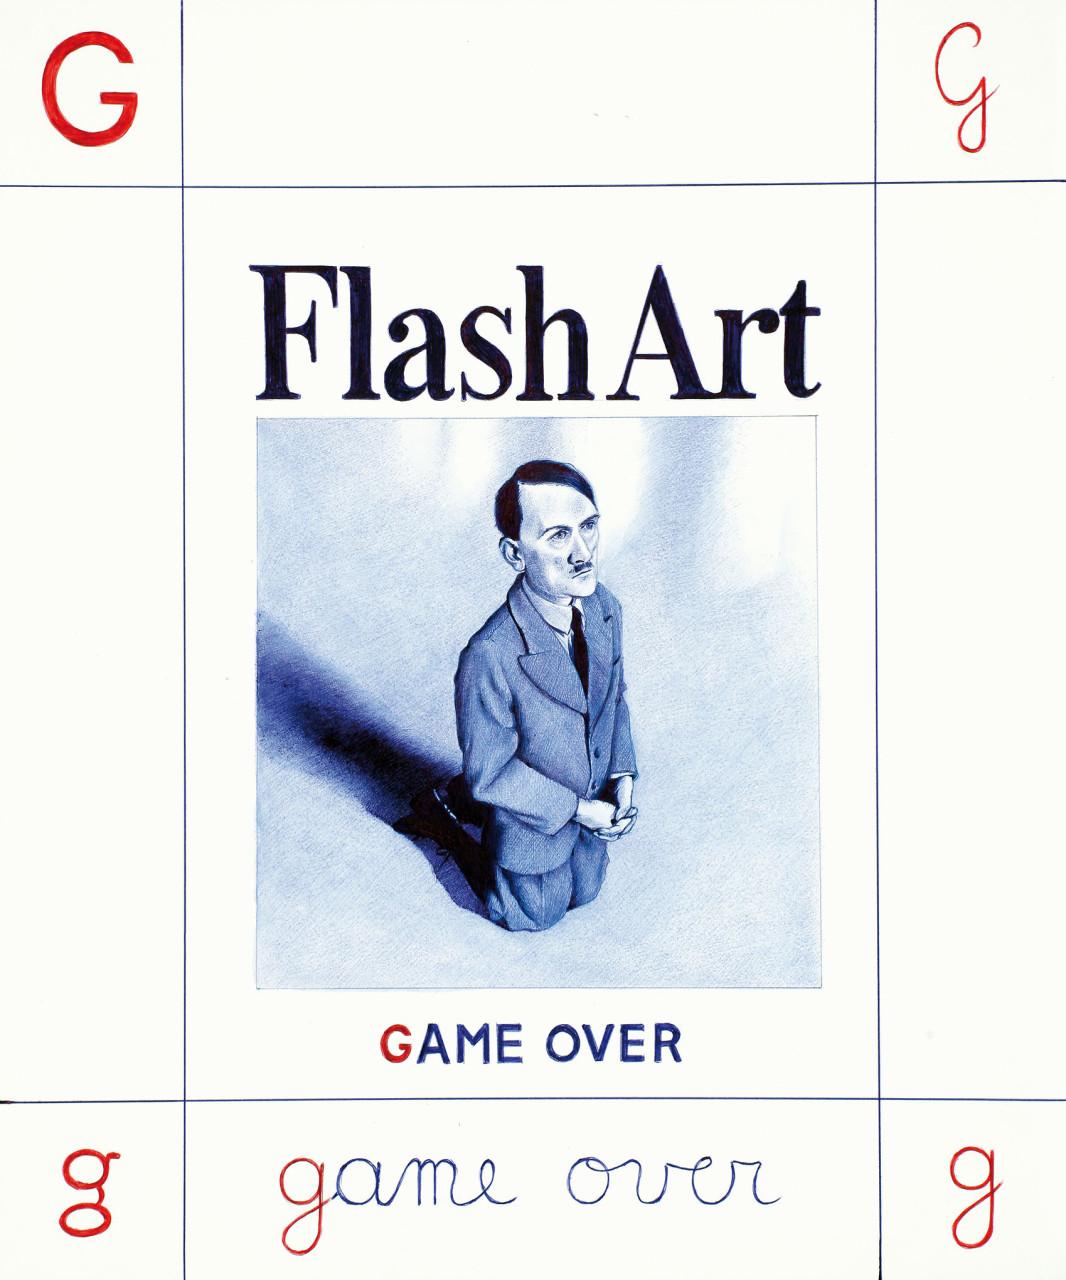 08G-game over_bassa